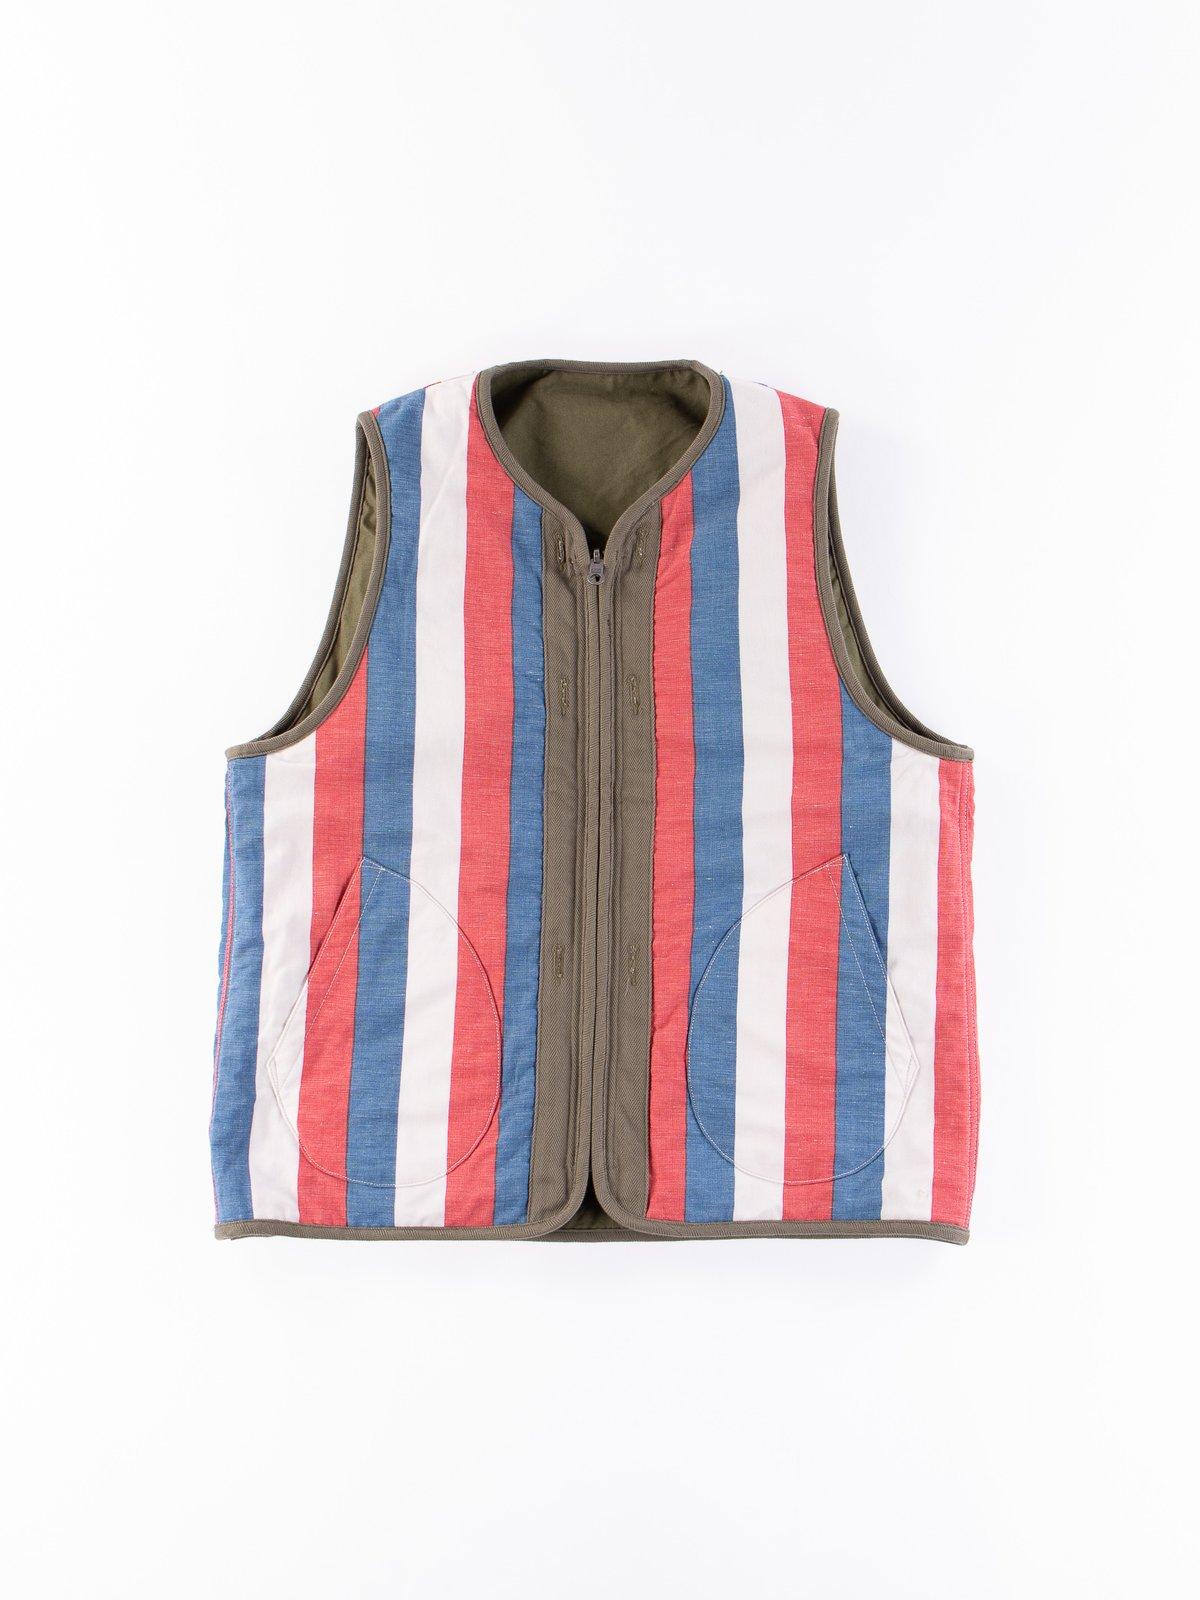 Olive Iris Cotton Liner Vest - Image 7